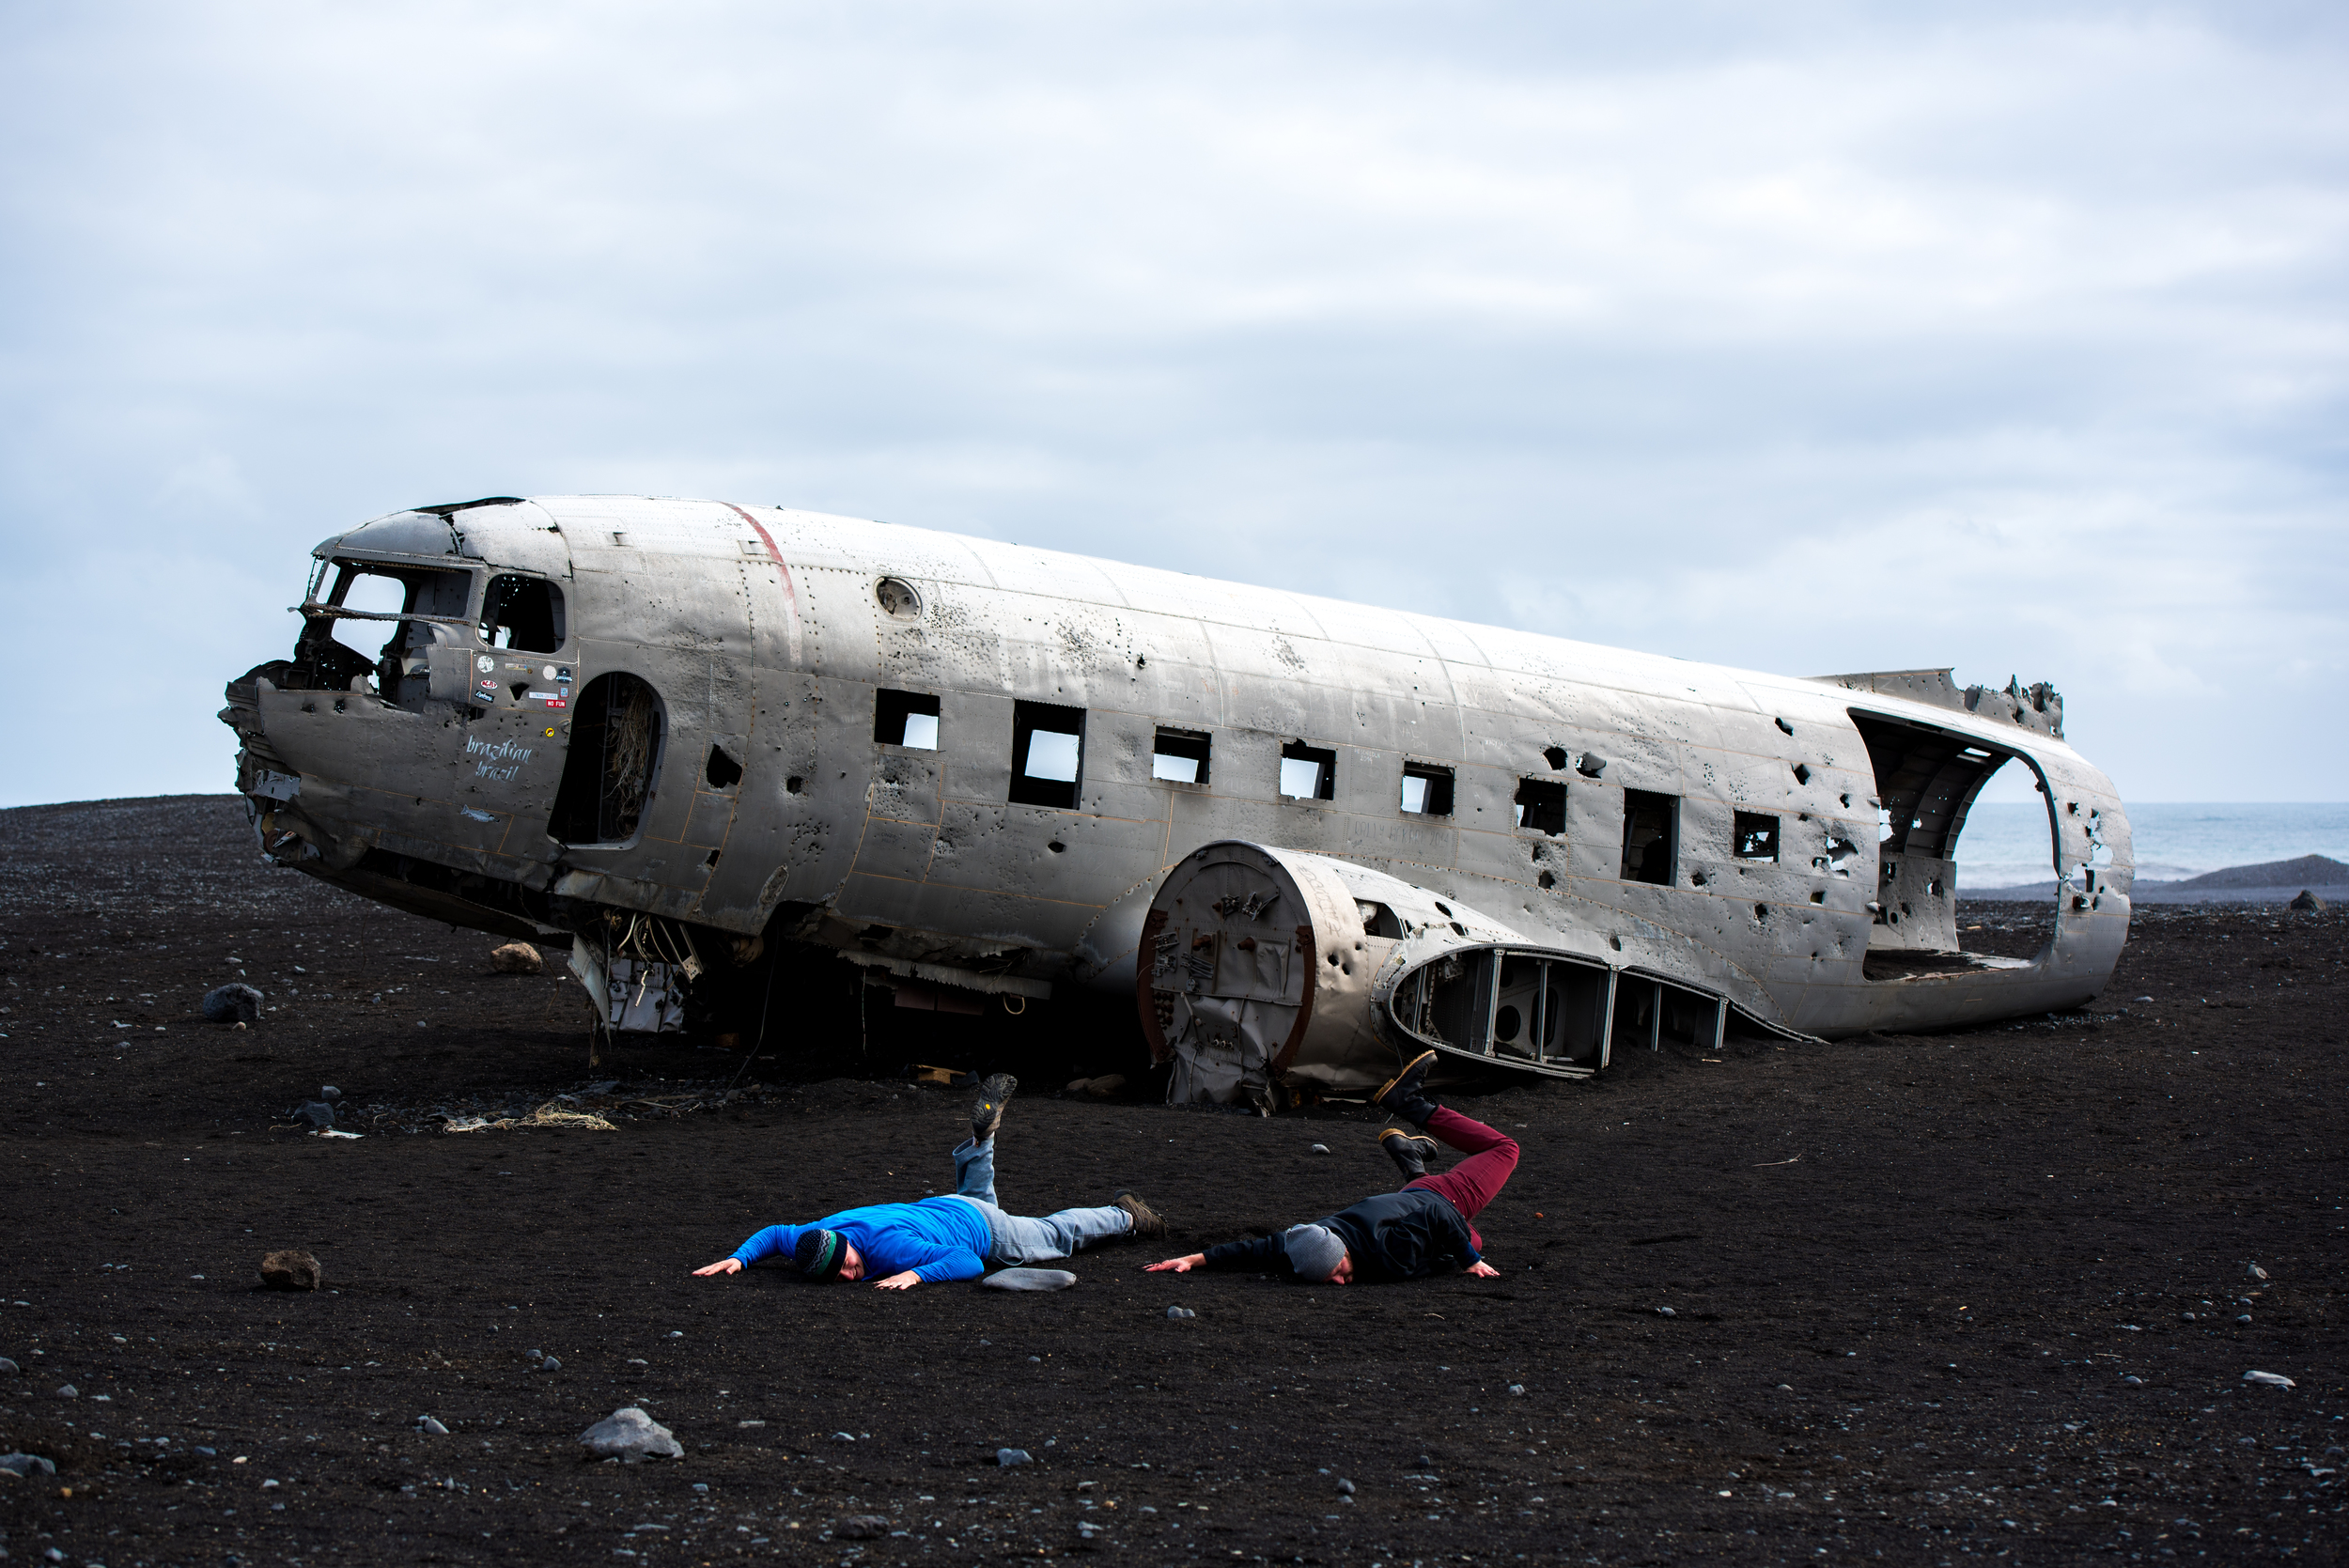 Iceland 2015 - HighRes-44.JPG